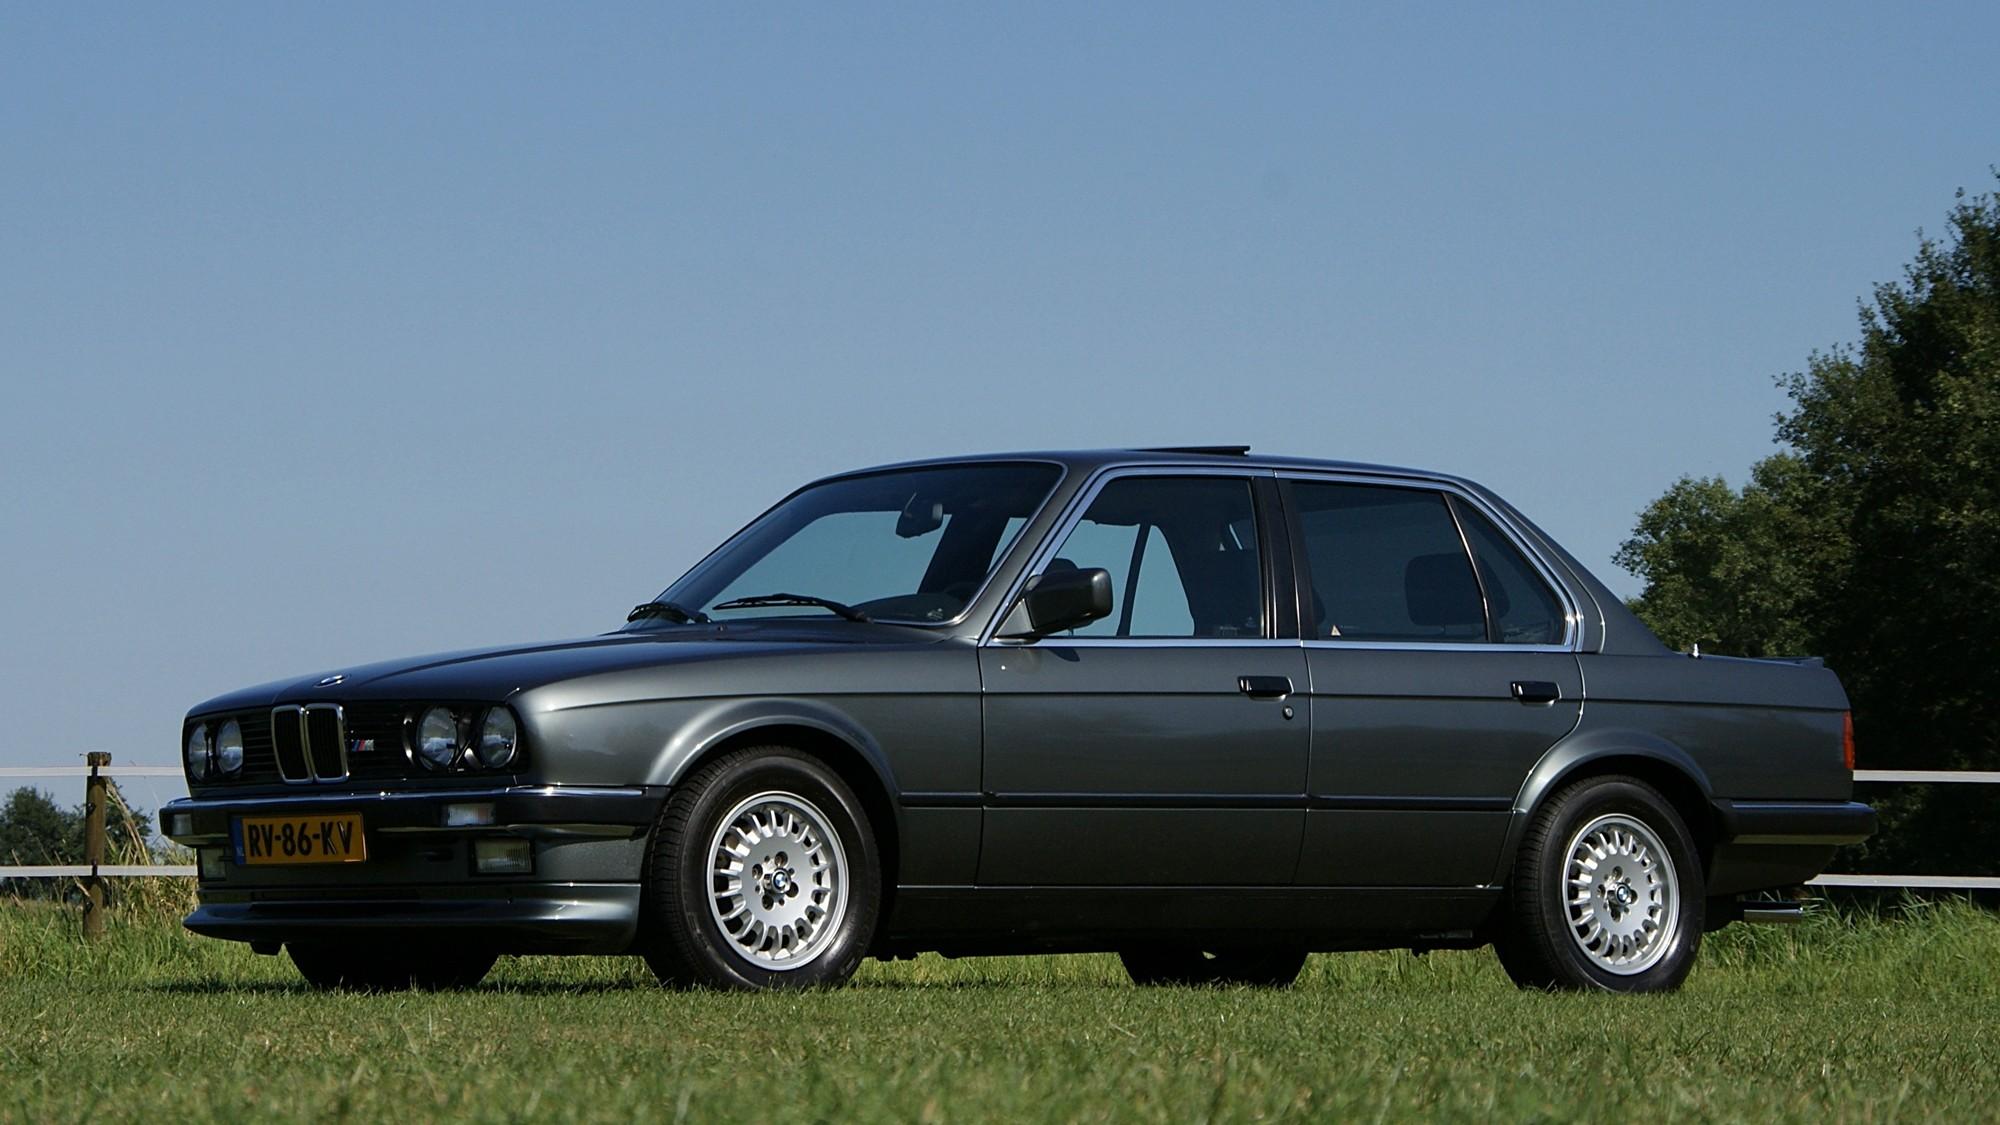 Elmark-online-automotive-content-marketing-1987-BMW-E30-320i-2000x1125